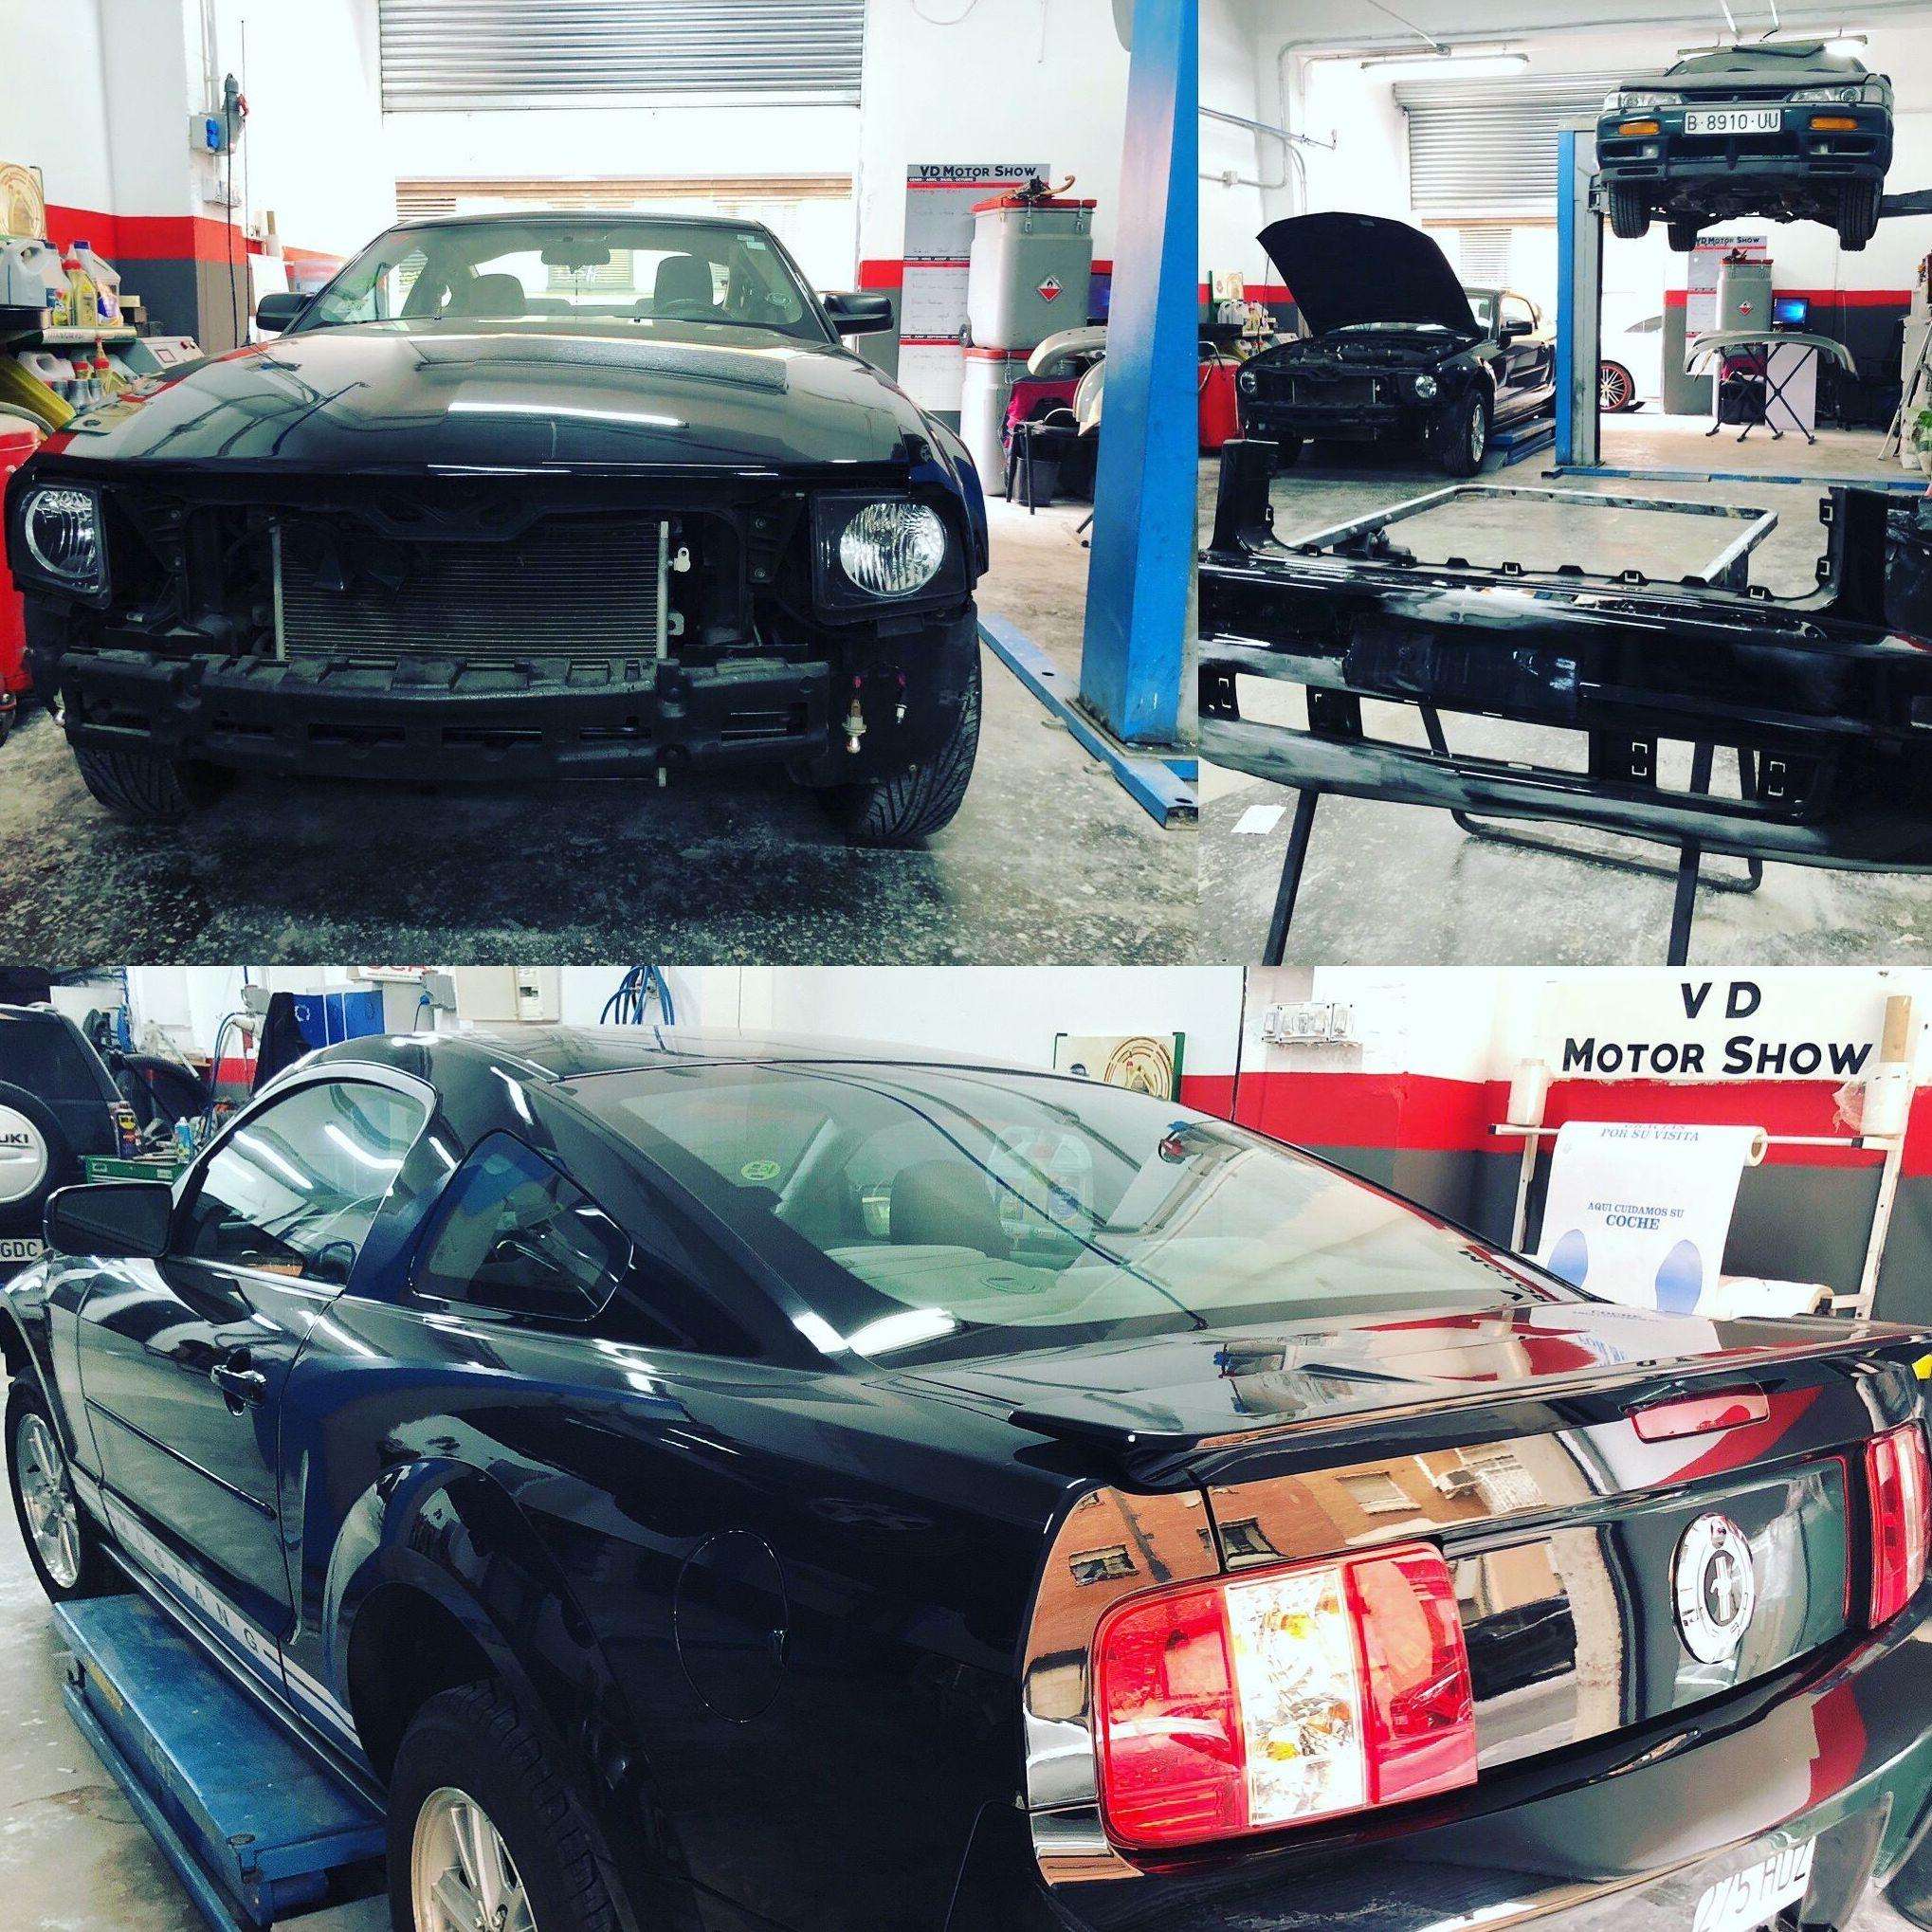 Ford Mustang 2007 v6 4.0